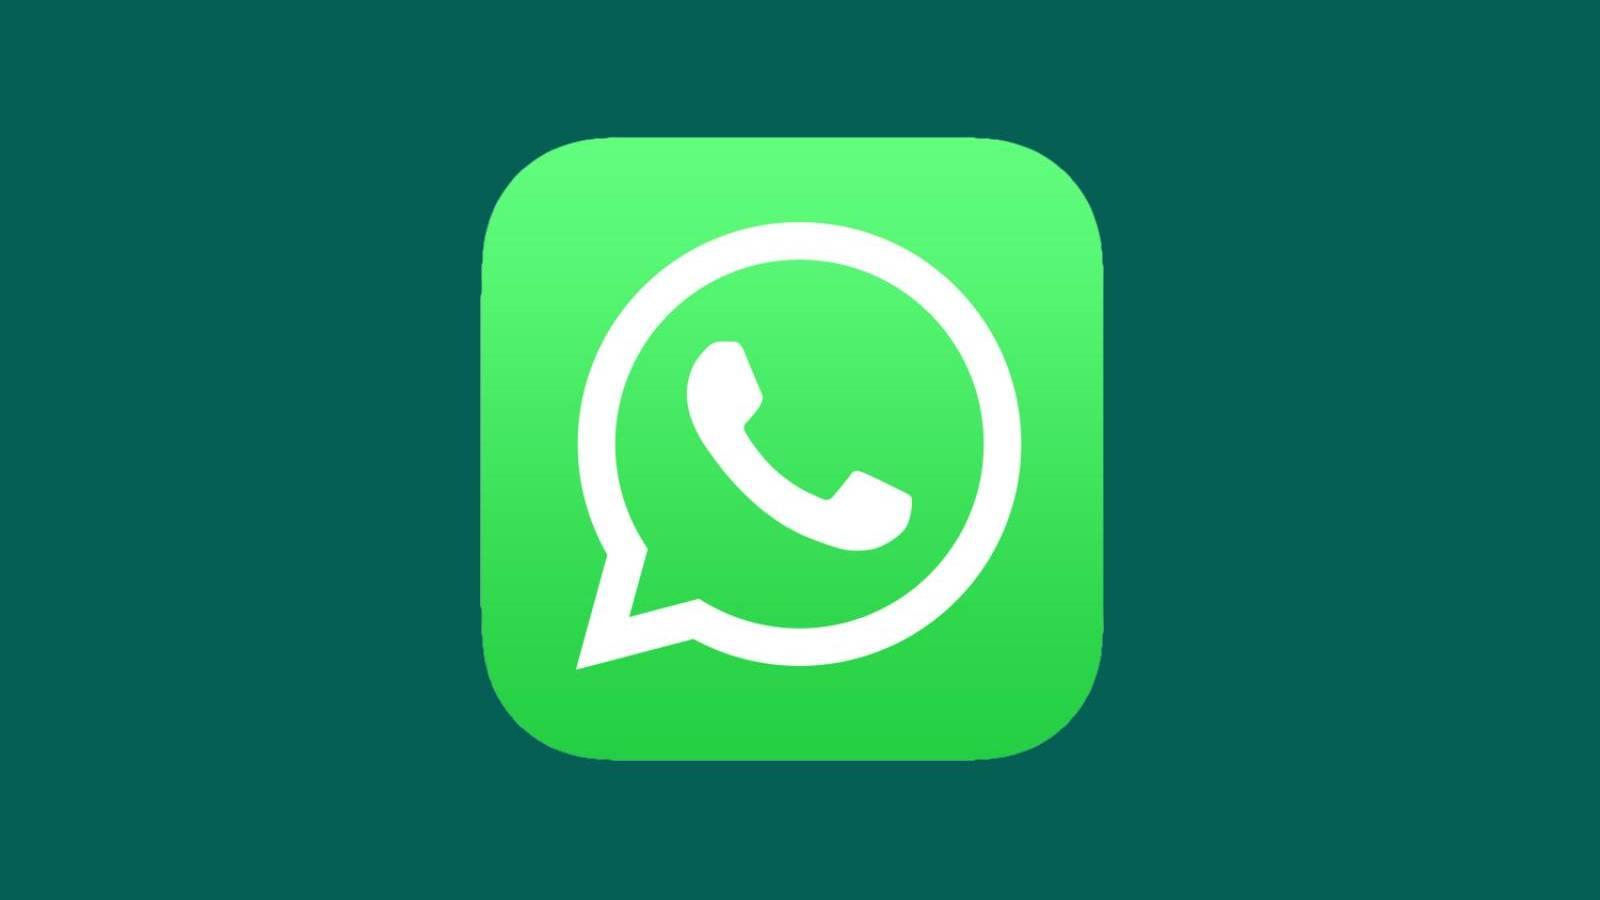 WhatsApp minimalist